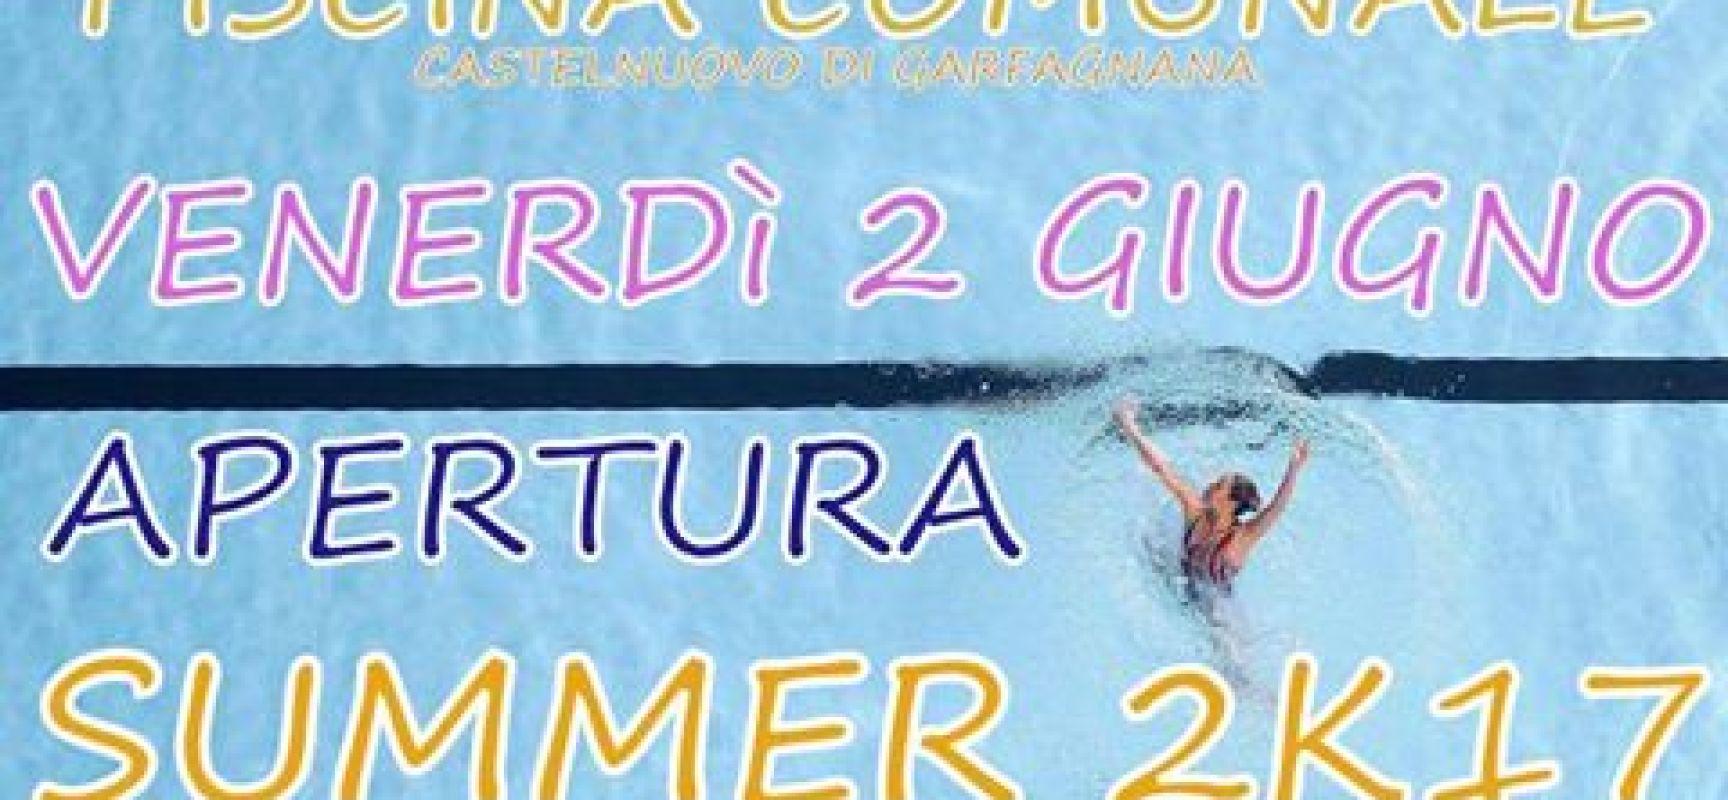 Castelnuovo di garfagnana venerd 2 giugno apertura piscina comunale verde azzurro notizie - Piscina comunale capannori ...